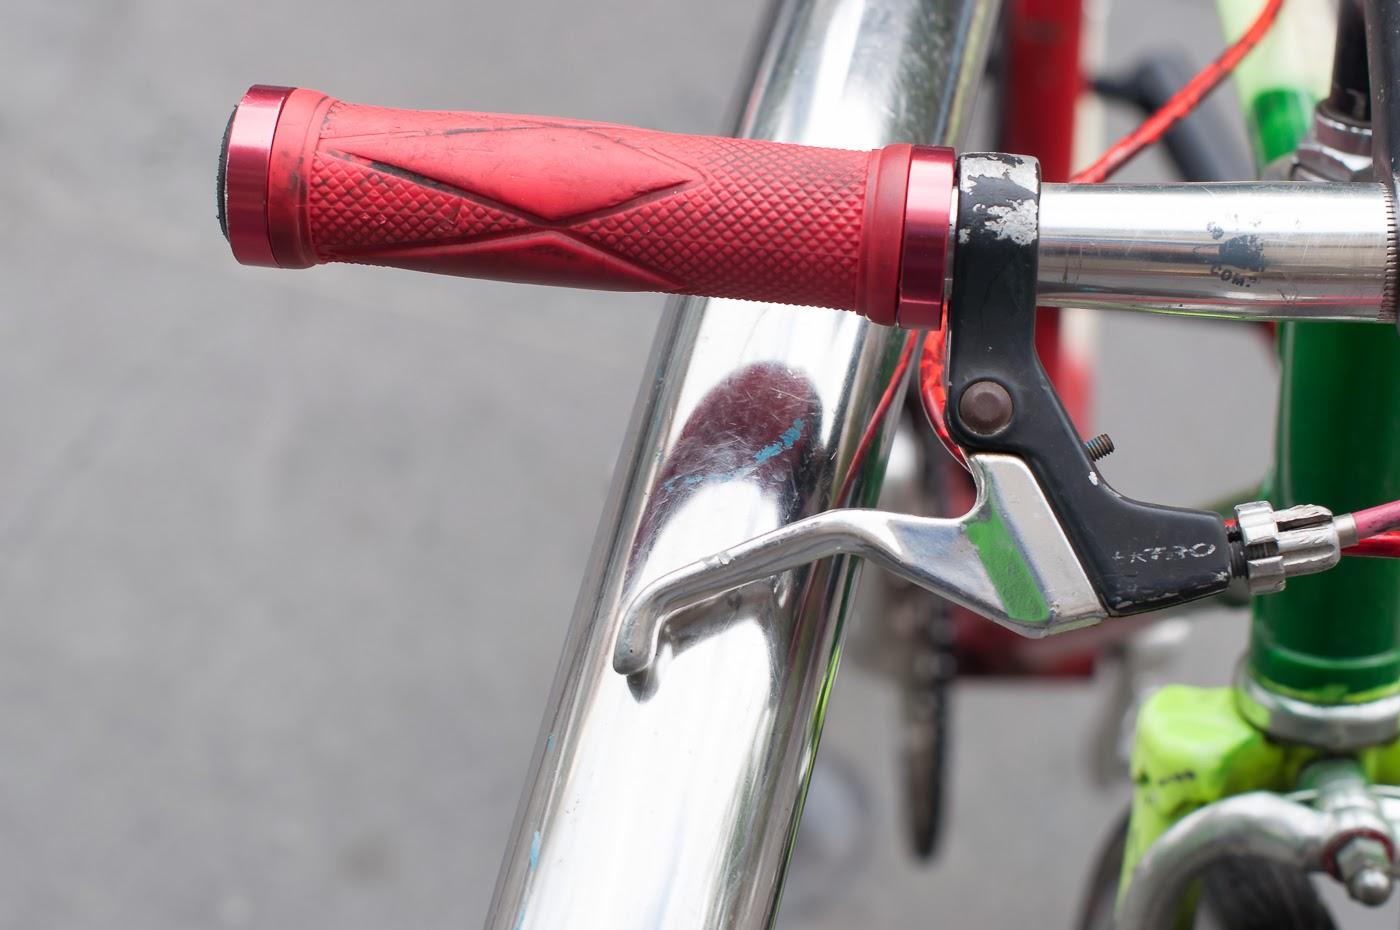 Pub bike, bike, bicycle, conversion, road bike, tim macauley, the biketorialist, Melbourne, Australia, swanston st, handlebar, grip, red, tektro